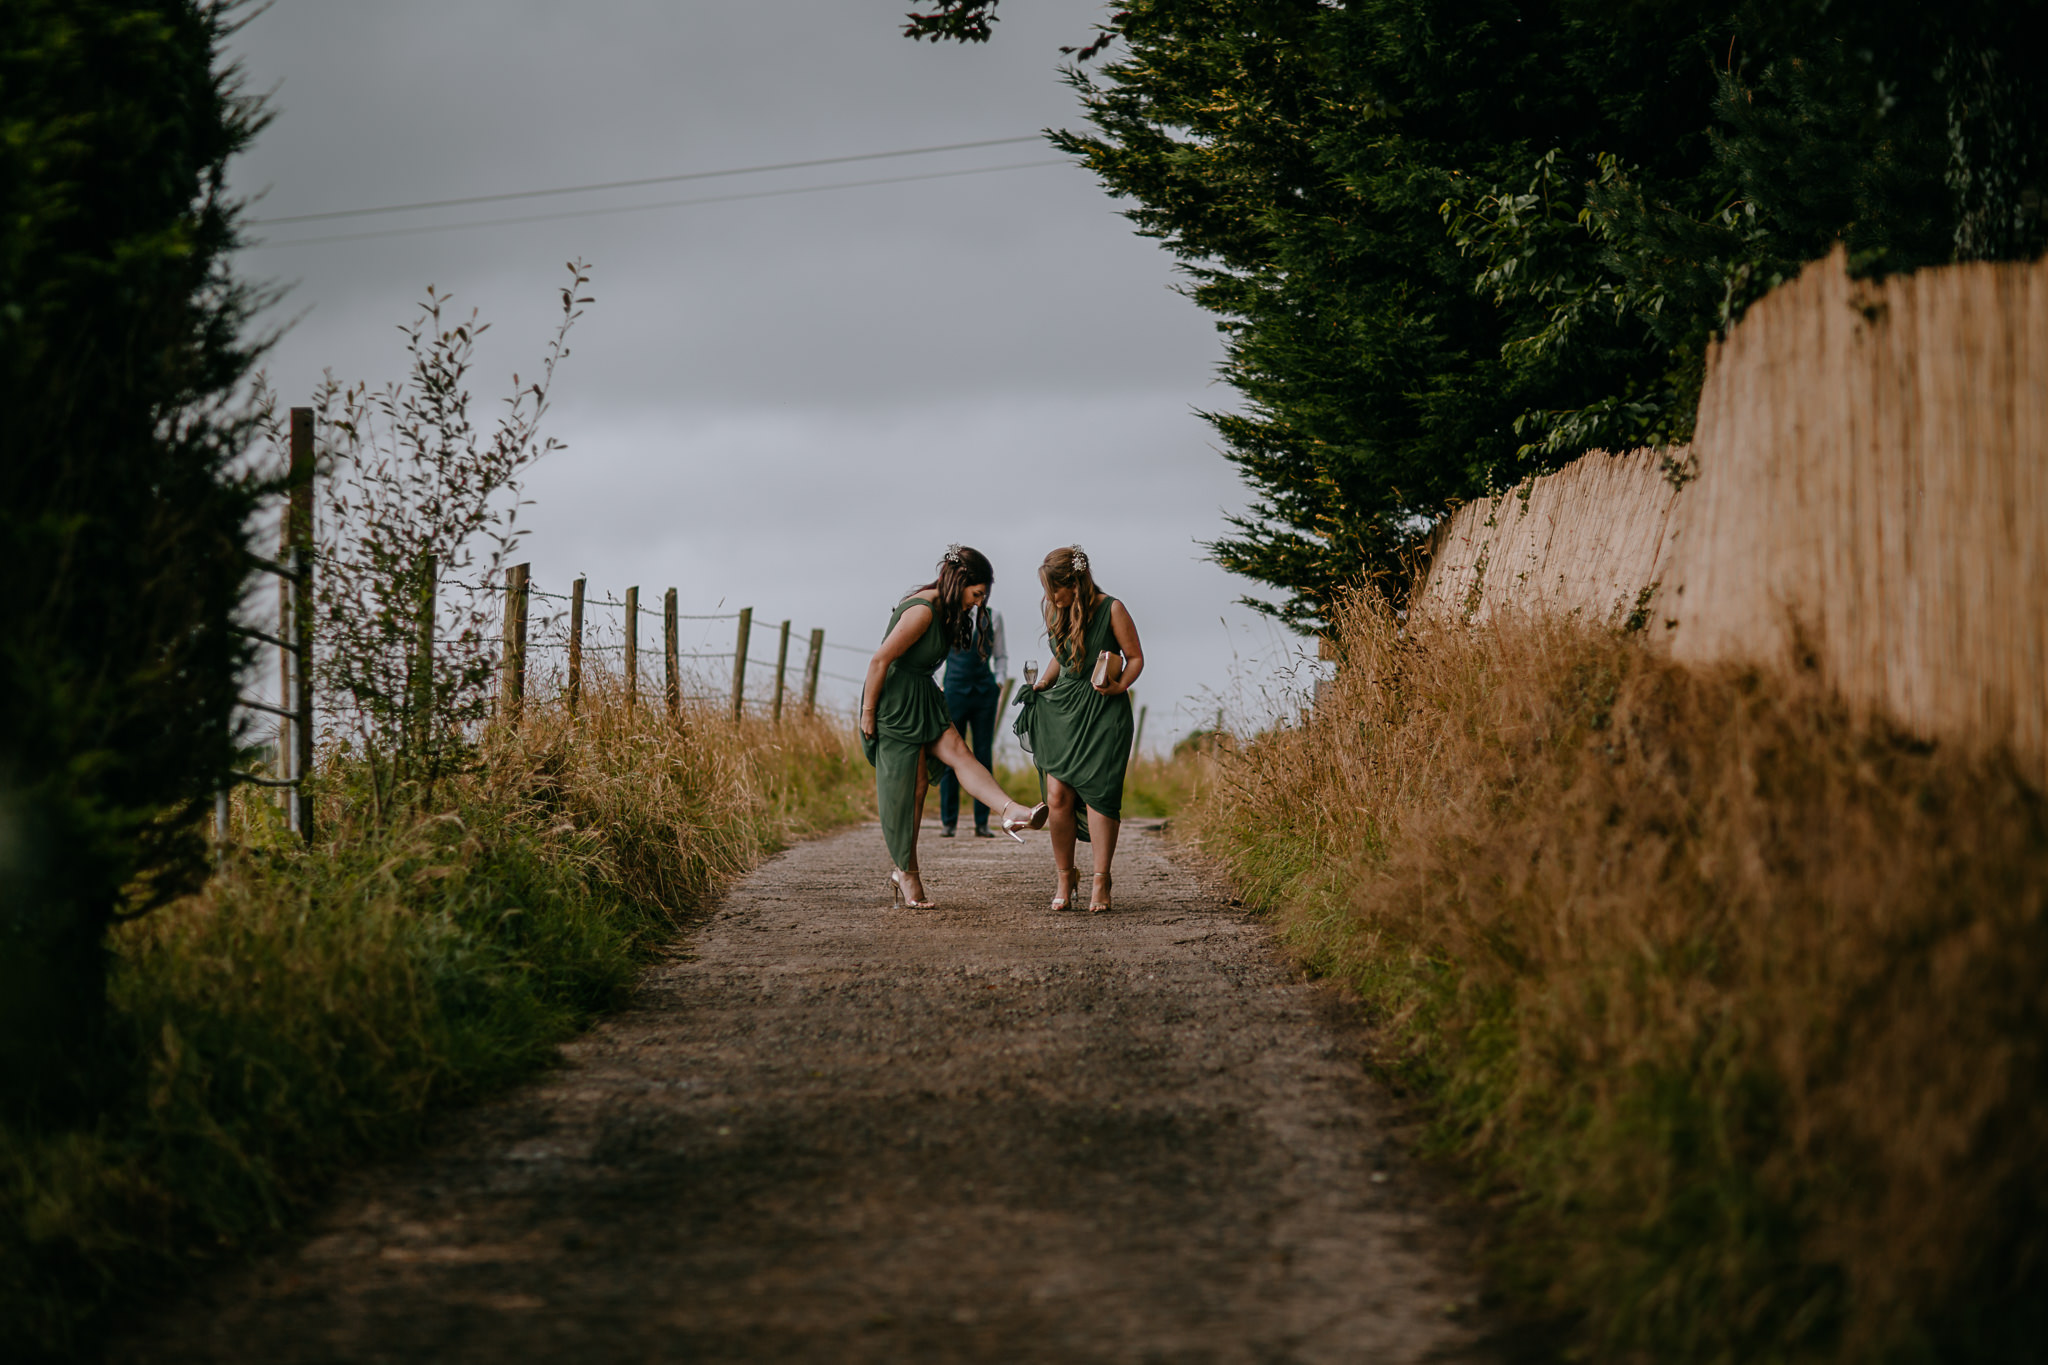 Northern-Ireland-wedding-photographers-the-martins-outdoor-barn-wedding-108.jpg